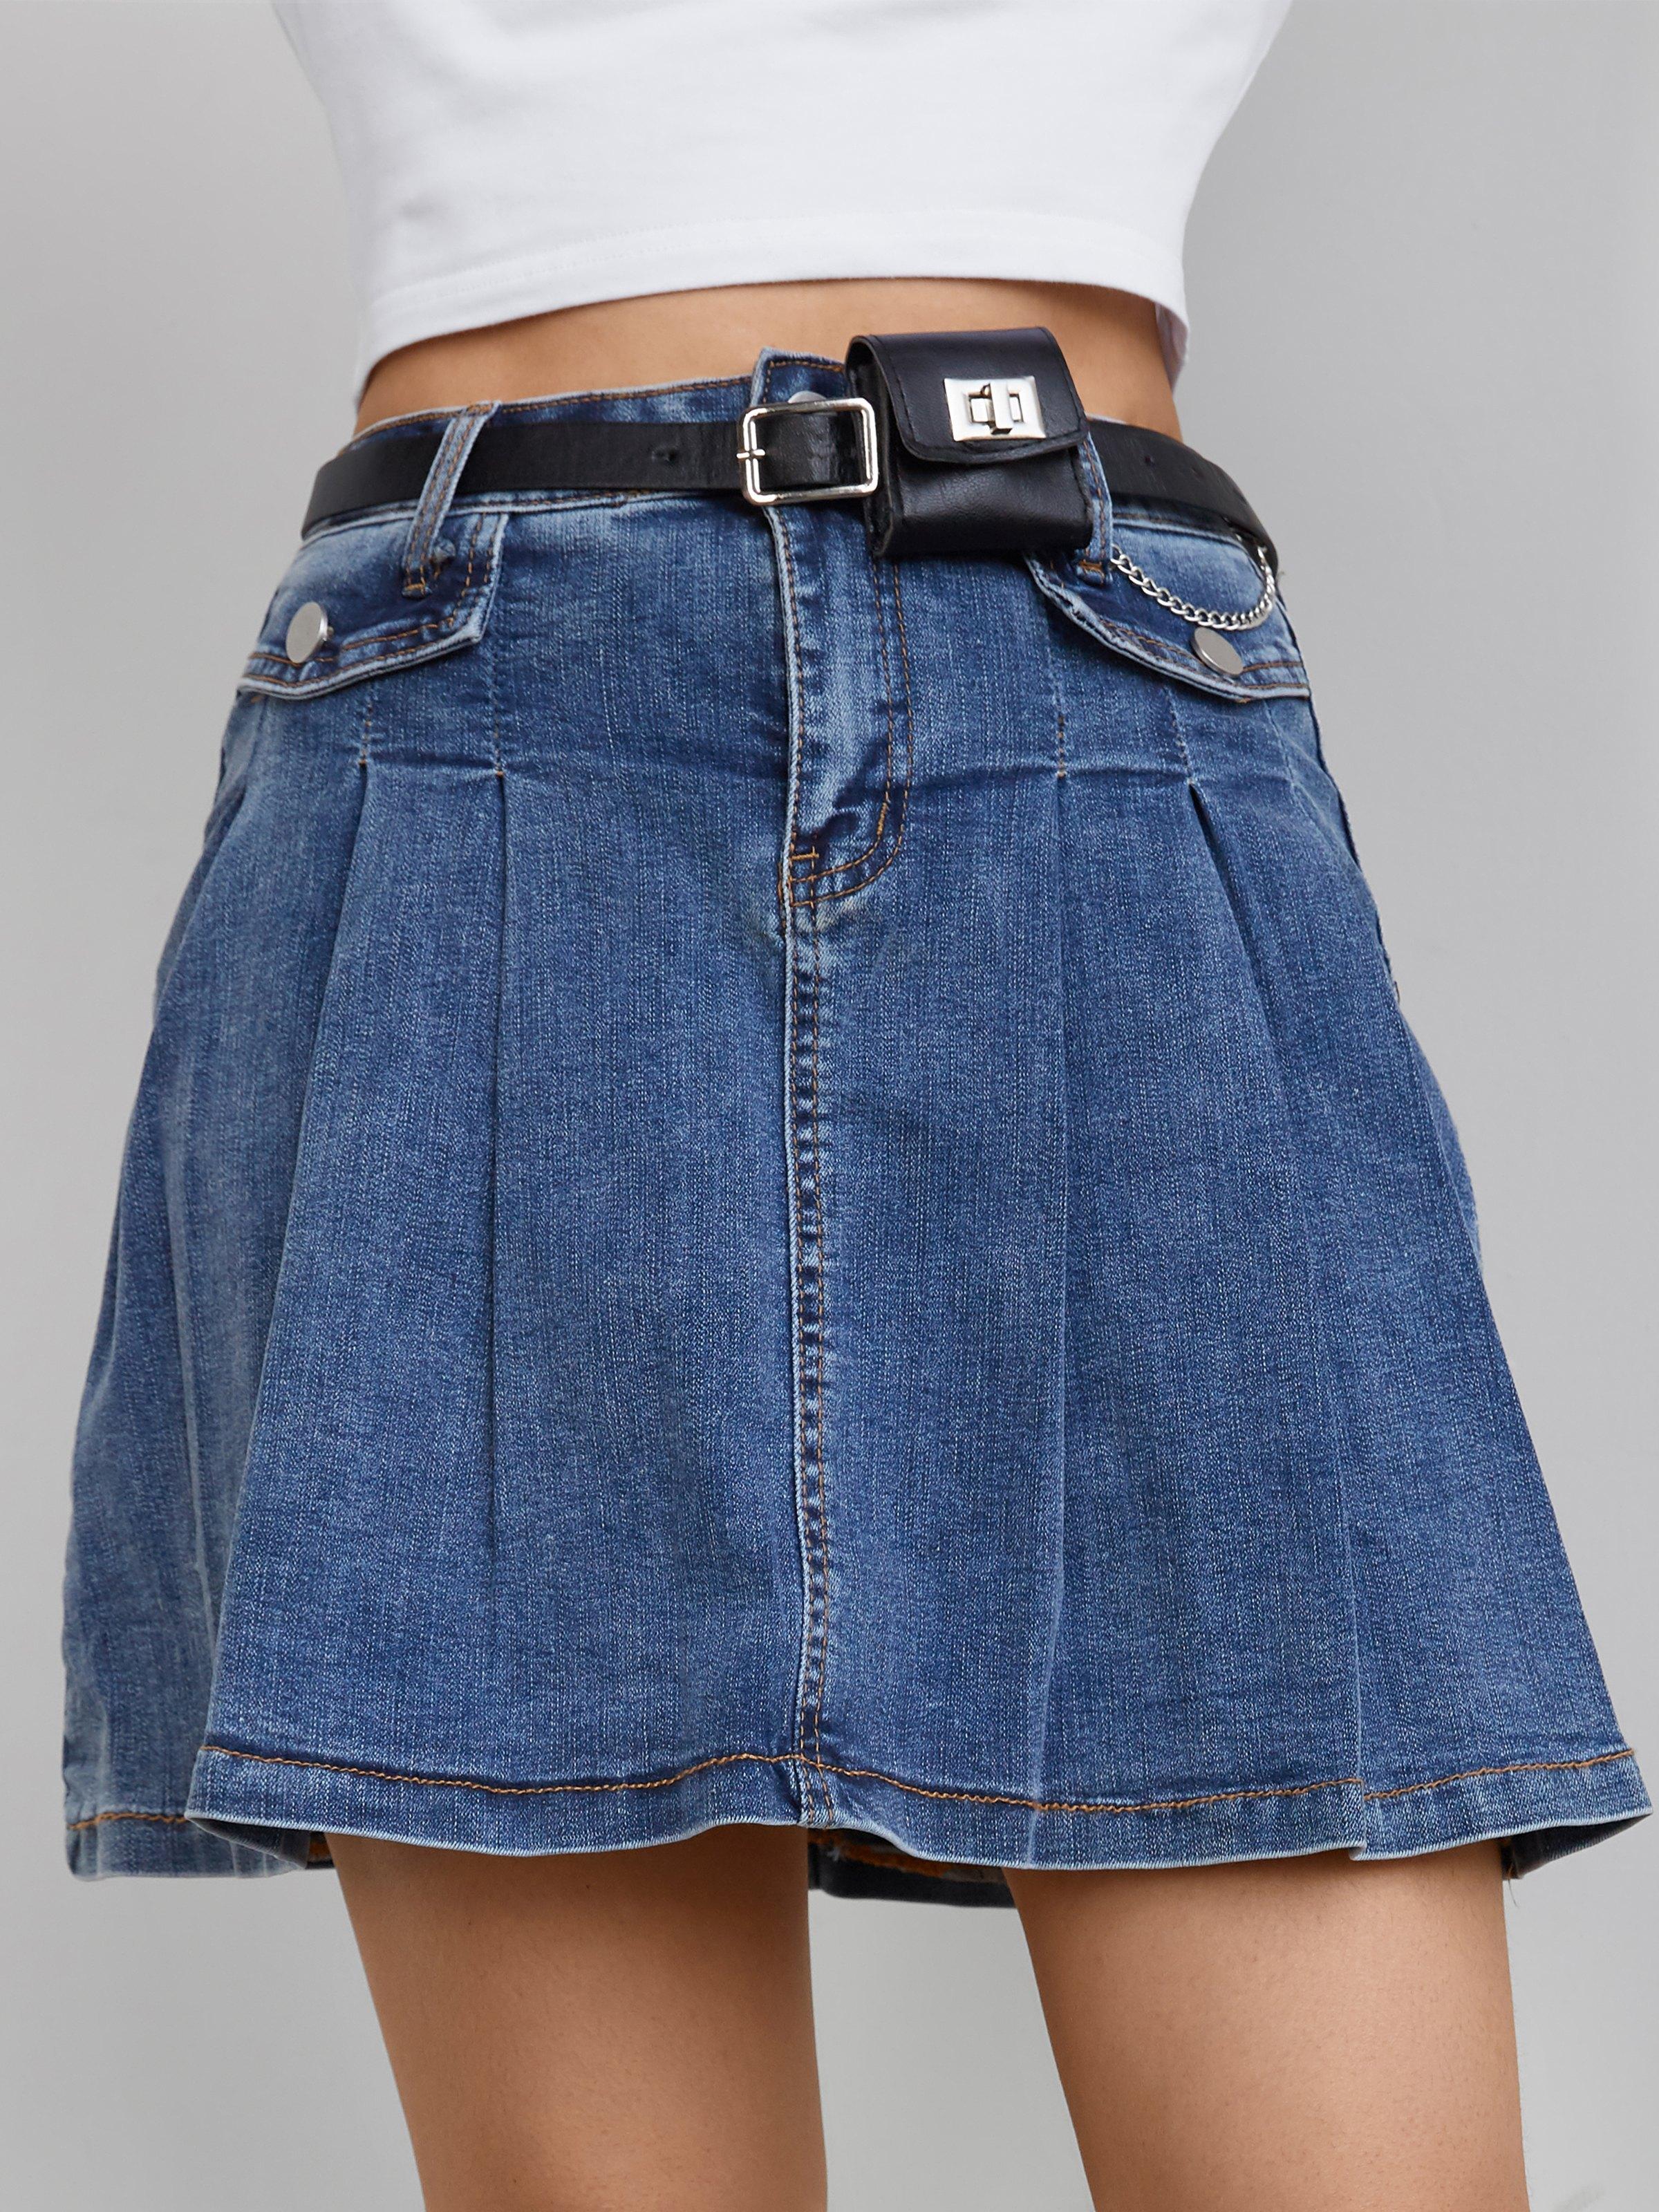 Pleated Denim Mini Skirt - Blue M